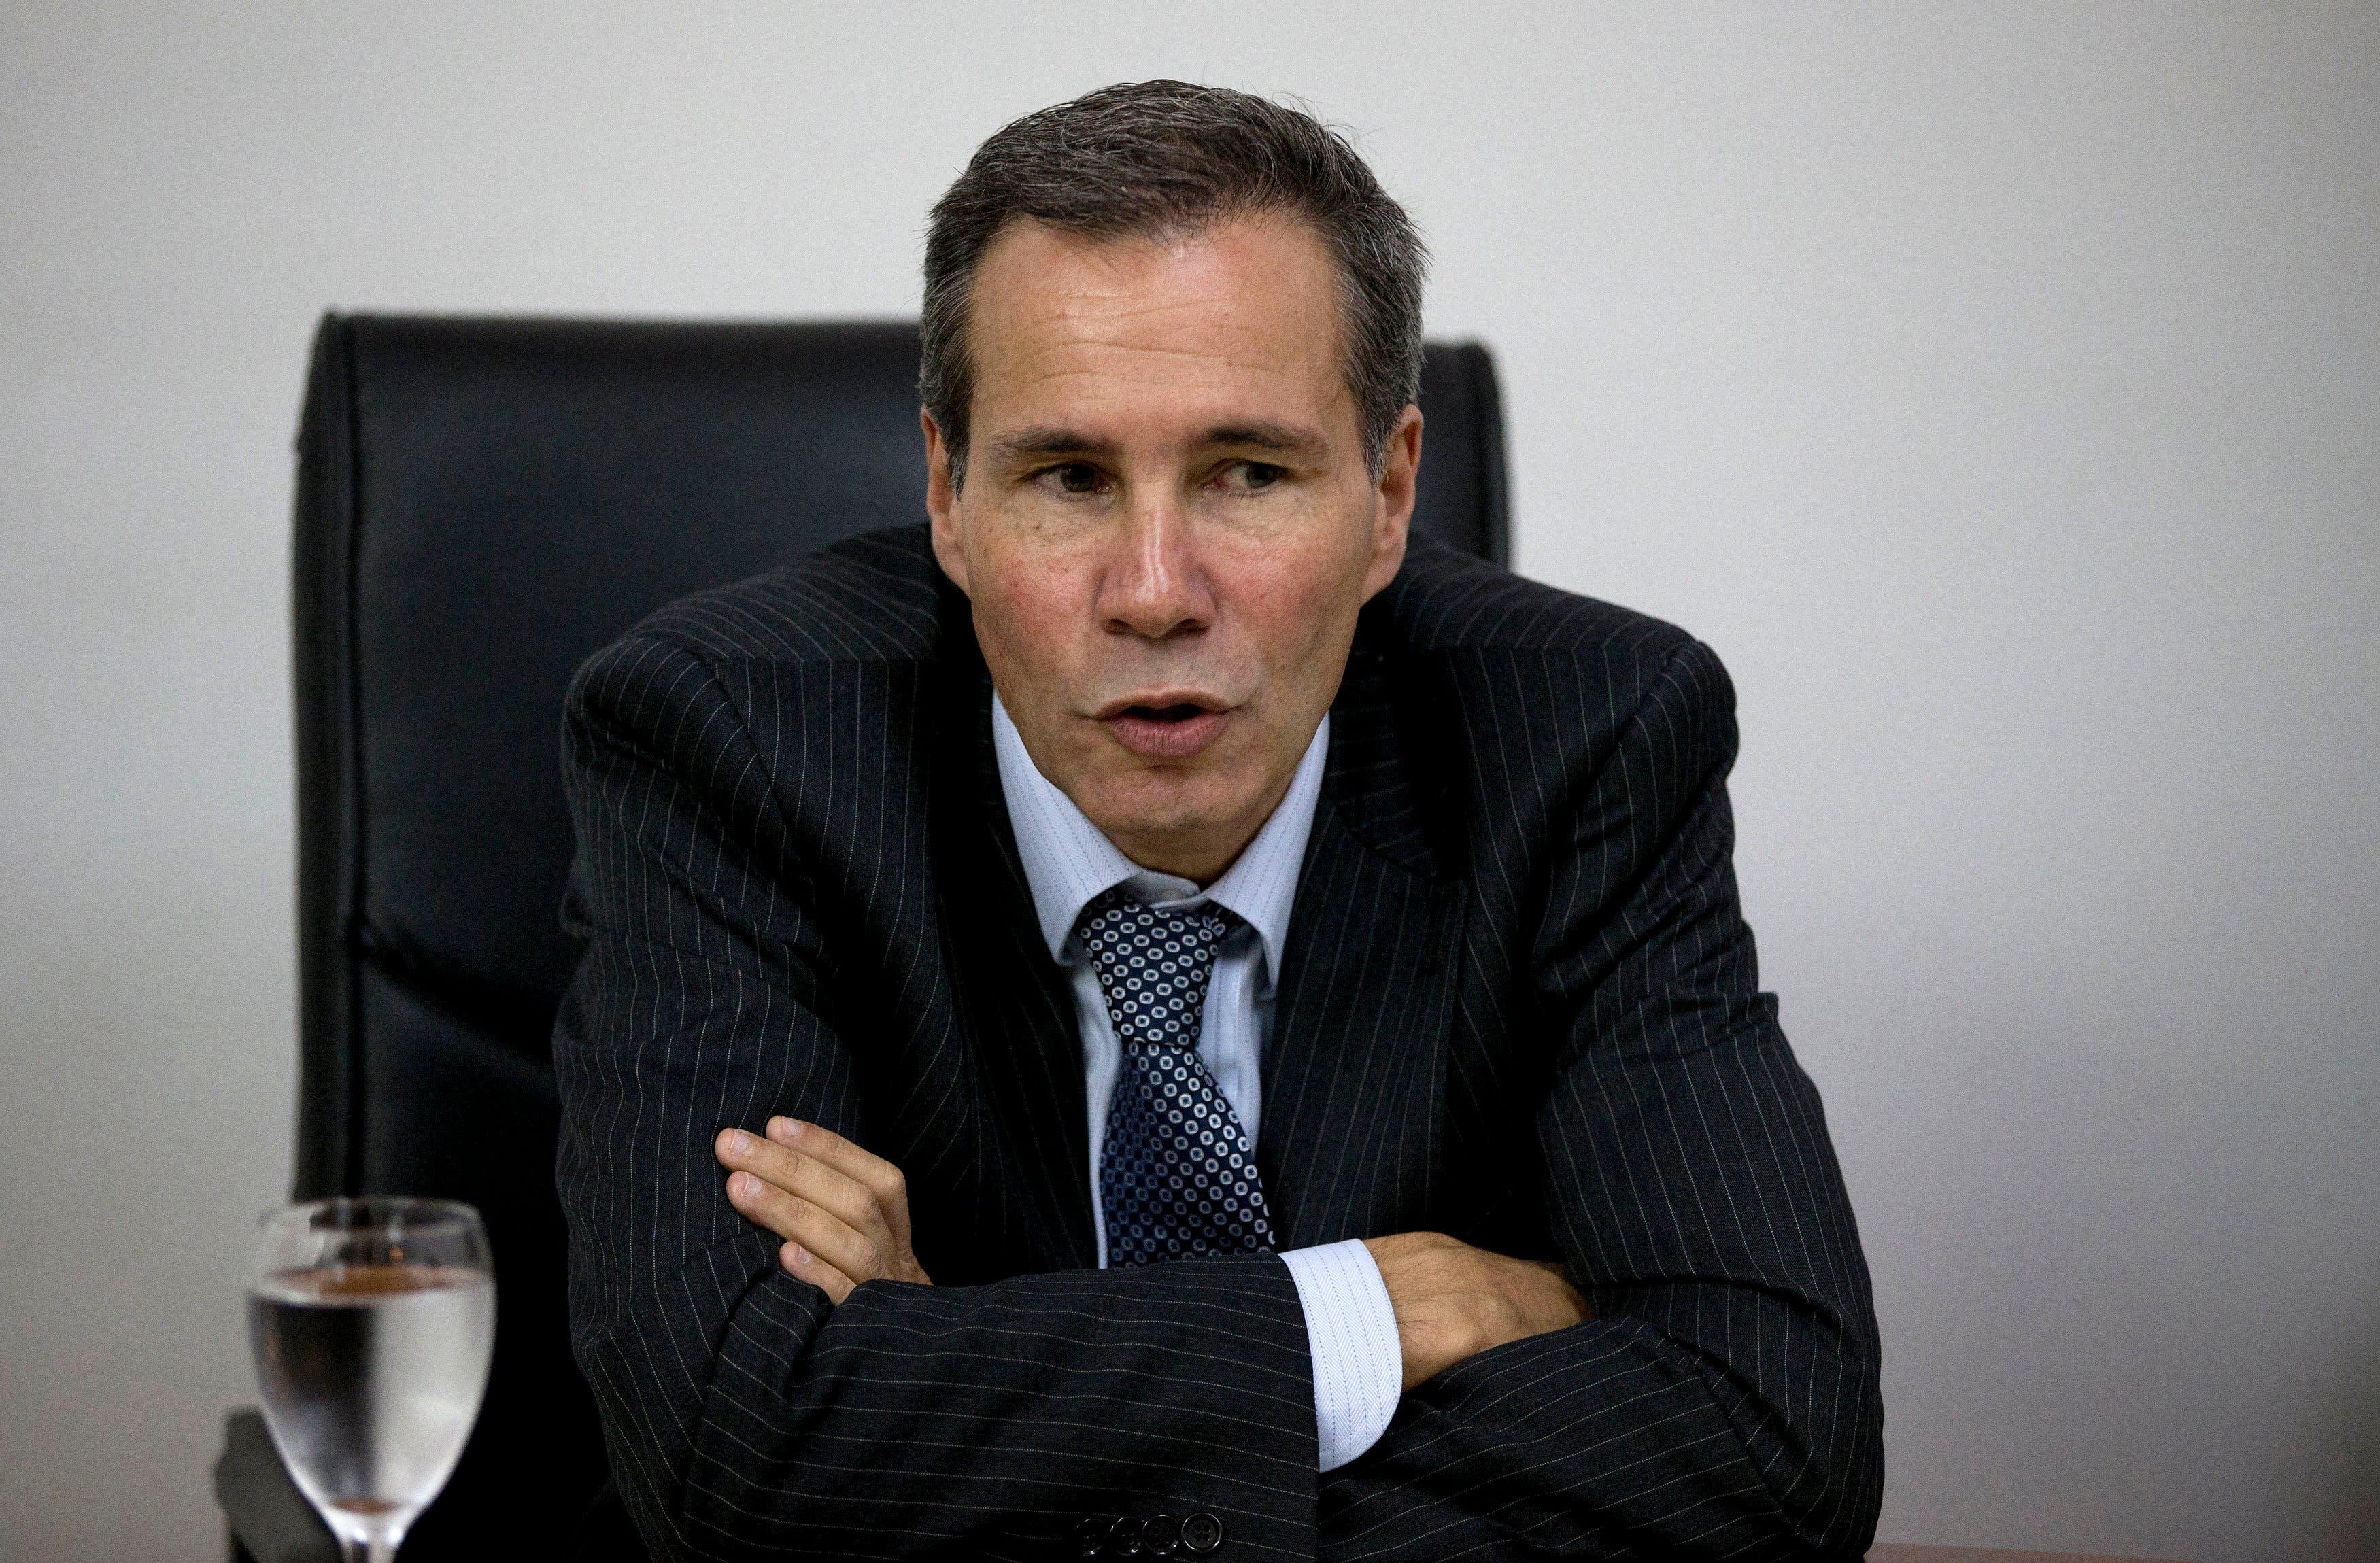 Gobierno argentino denuncia a abogado por publicar foto de cadáver de Nisman